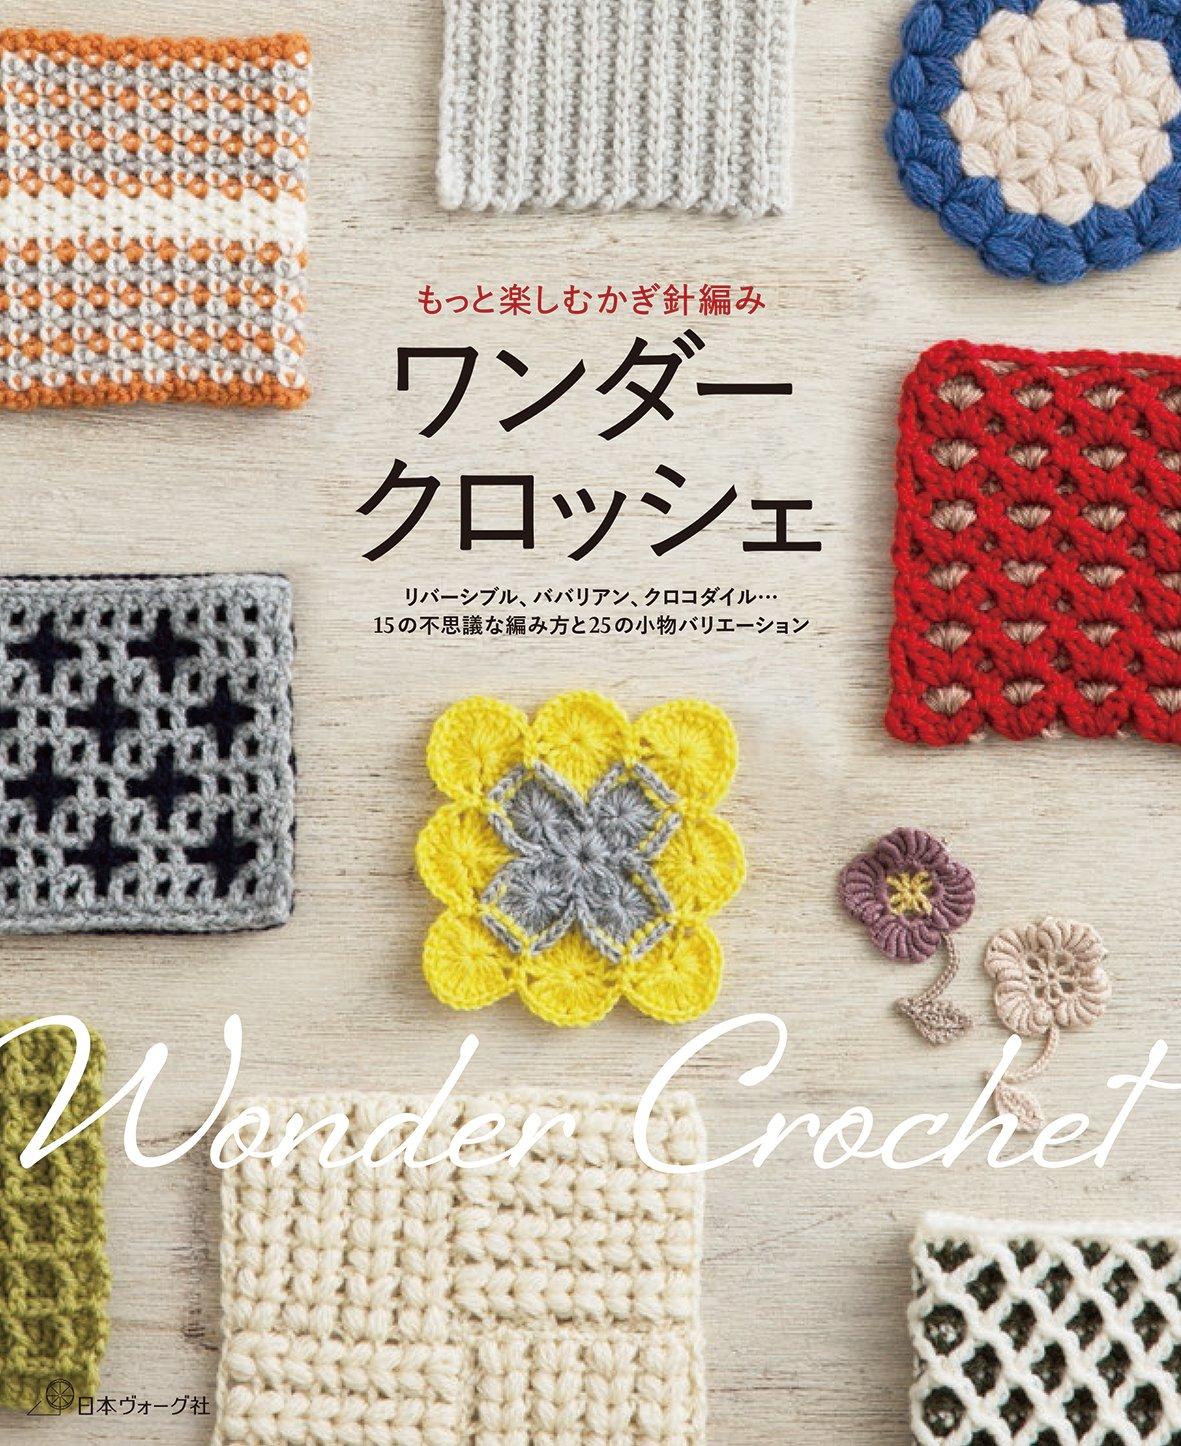 Wonder Crochet